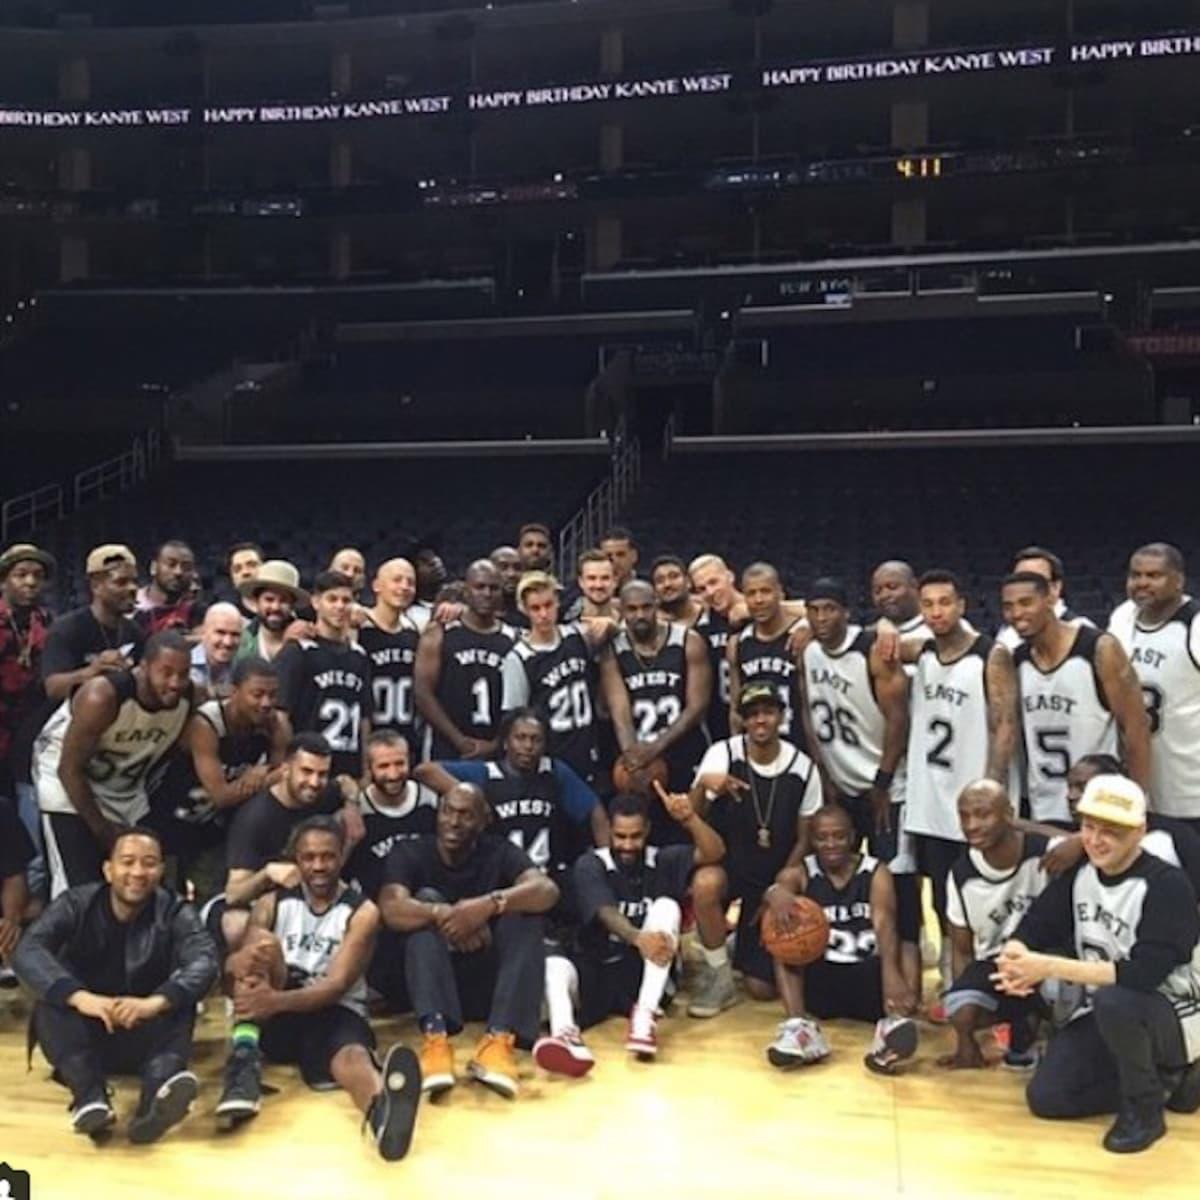 Houston, Kanye West birthday party at Staples Center_July 2015